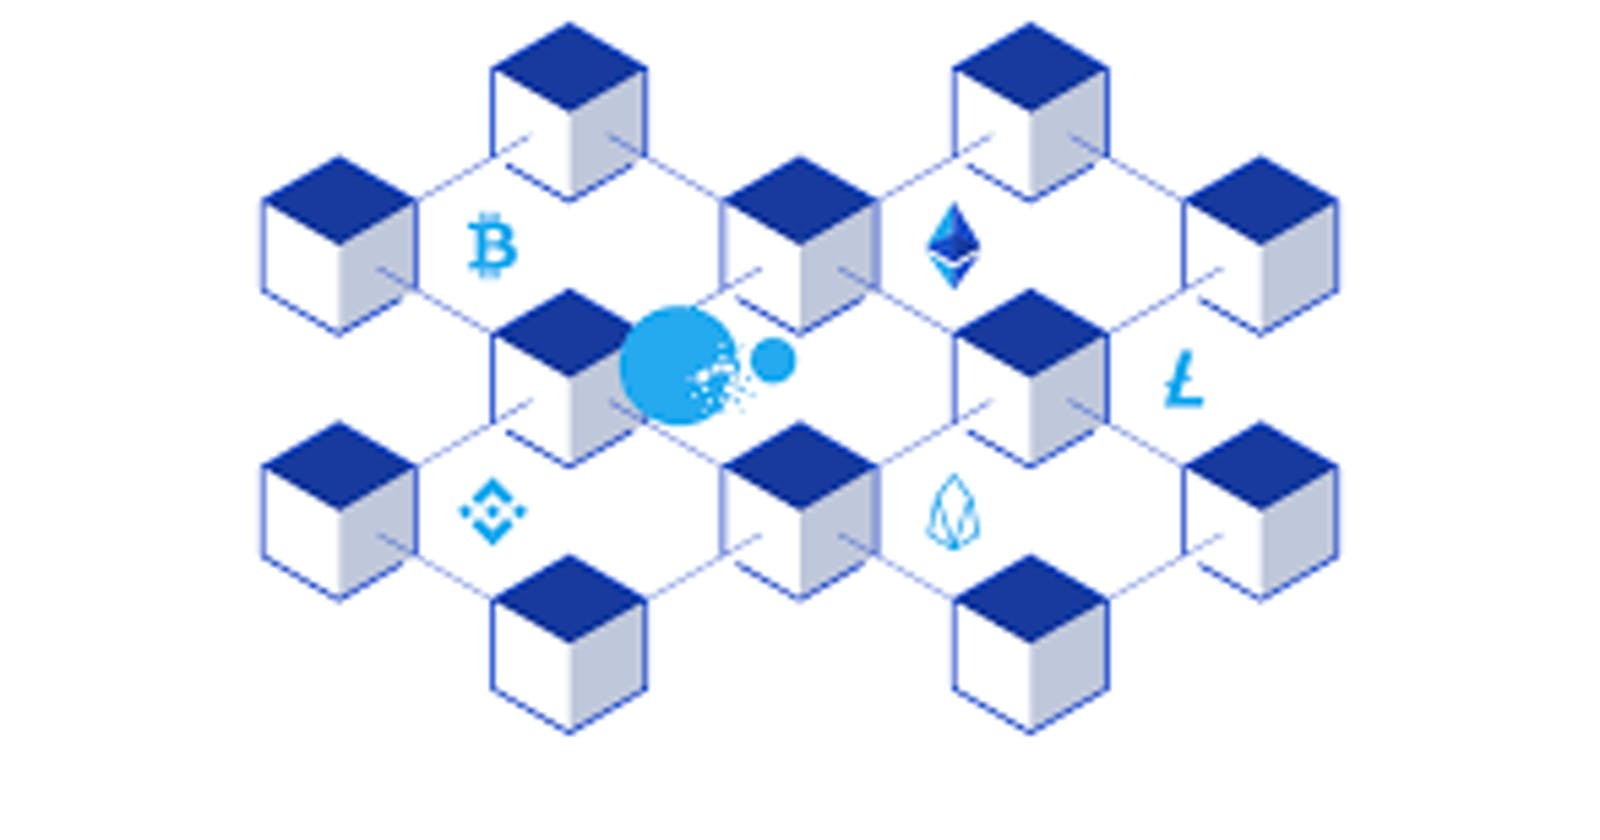 Blockchain Revolution!